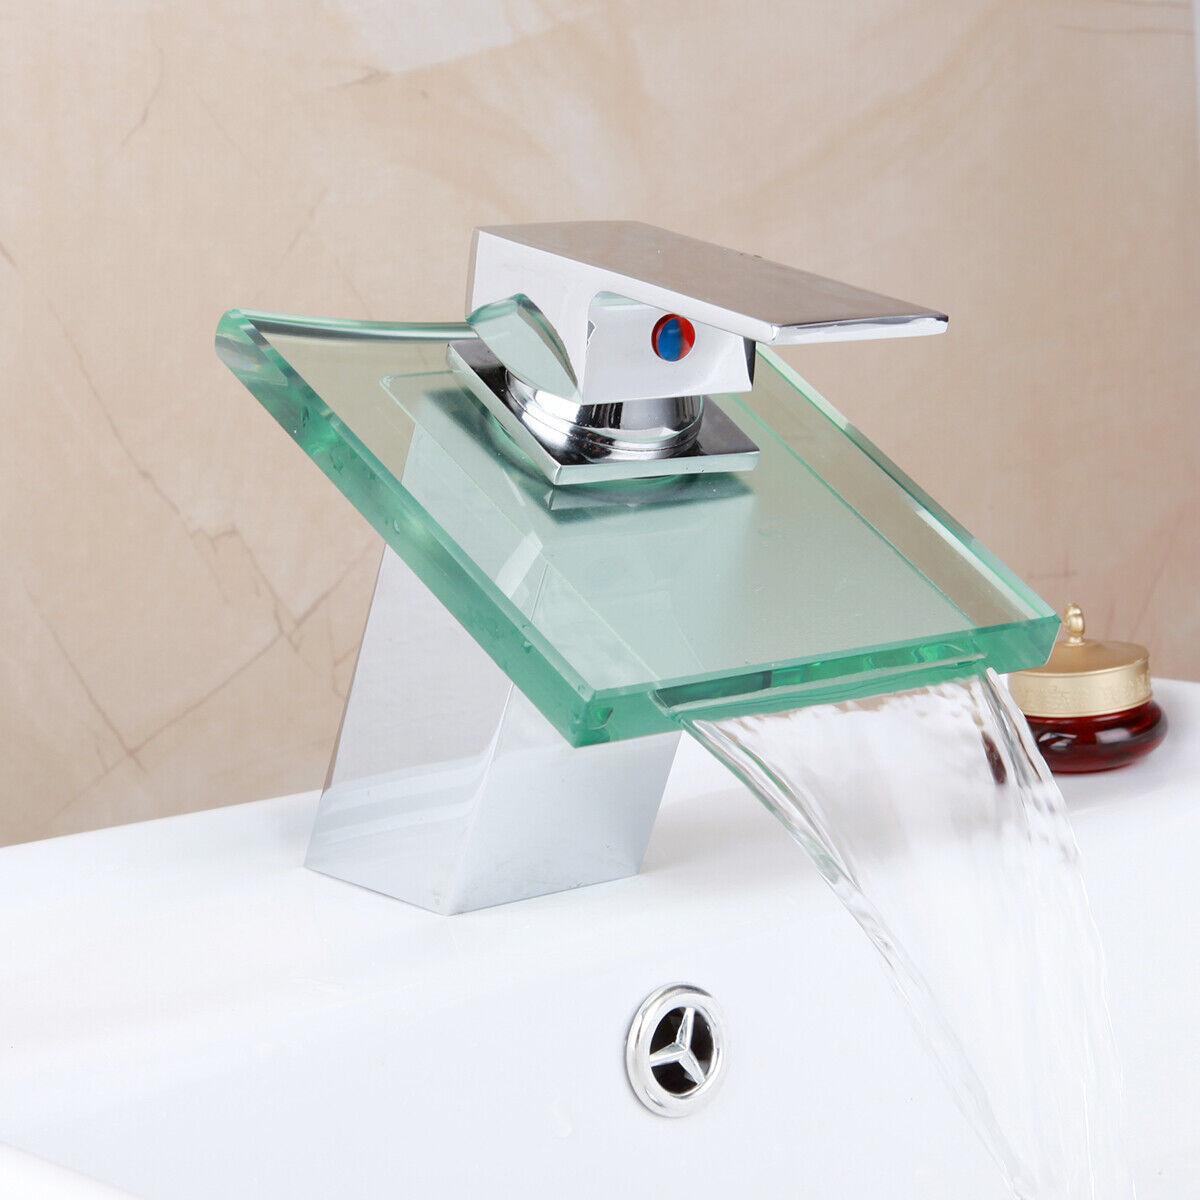 Bathroom Tall Chrome Glass Waterfall Spout Basin Faucet Vessel Sink Mixer Tap